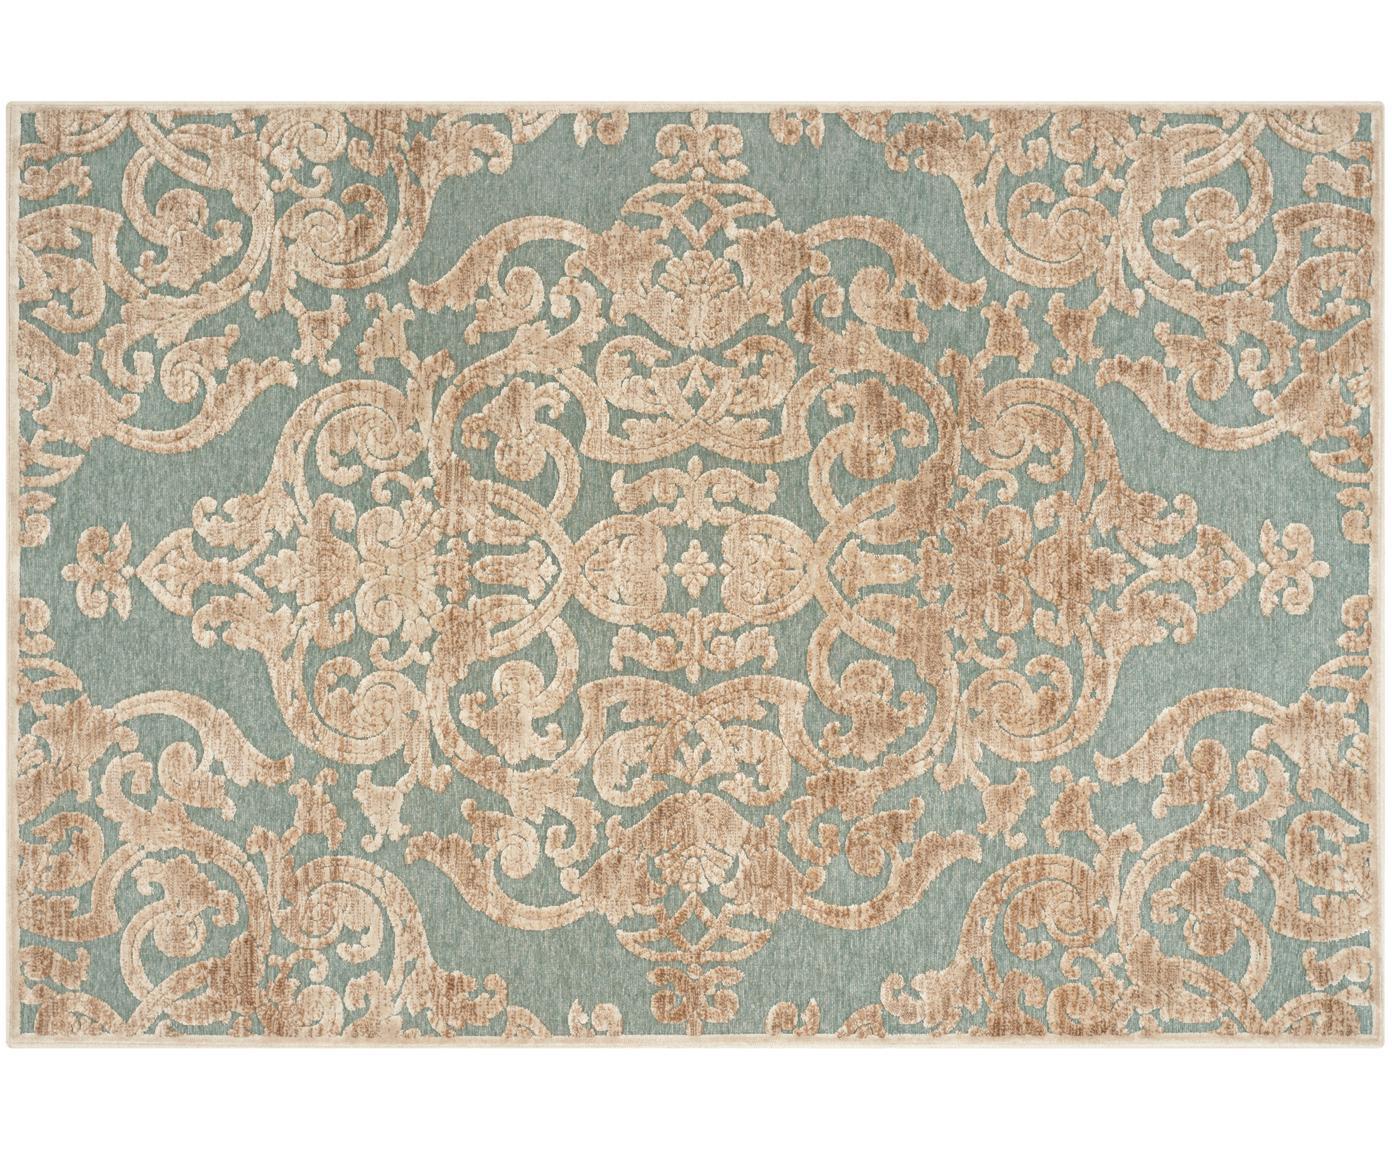 Vintage Viskoseteppich Marigot mit Hoch-Tief-Effekt, Flor: 100% Viskose, Aqua, Creme, B 120 x L 170 cm (Grösse S)